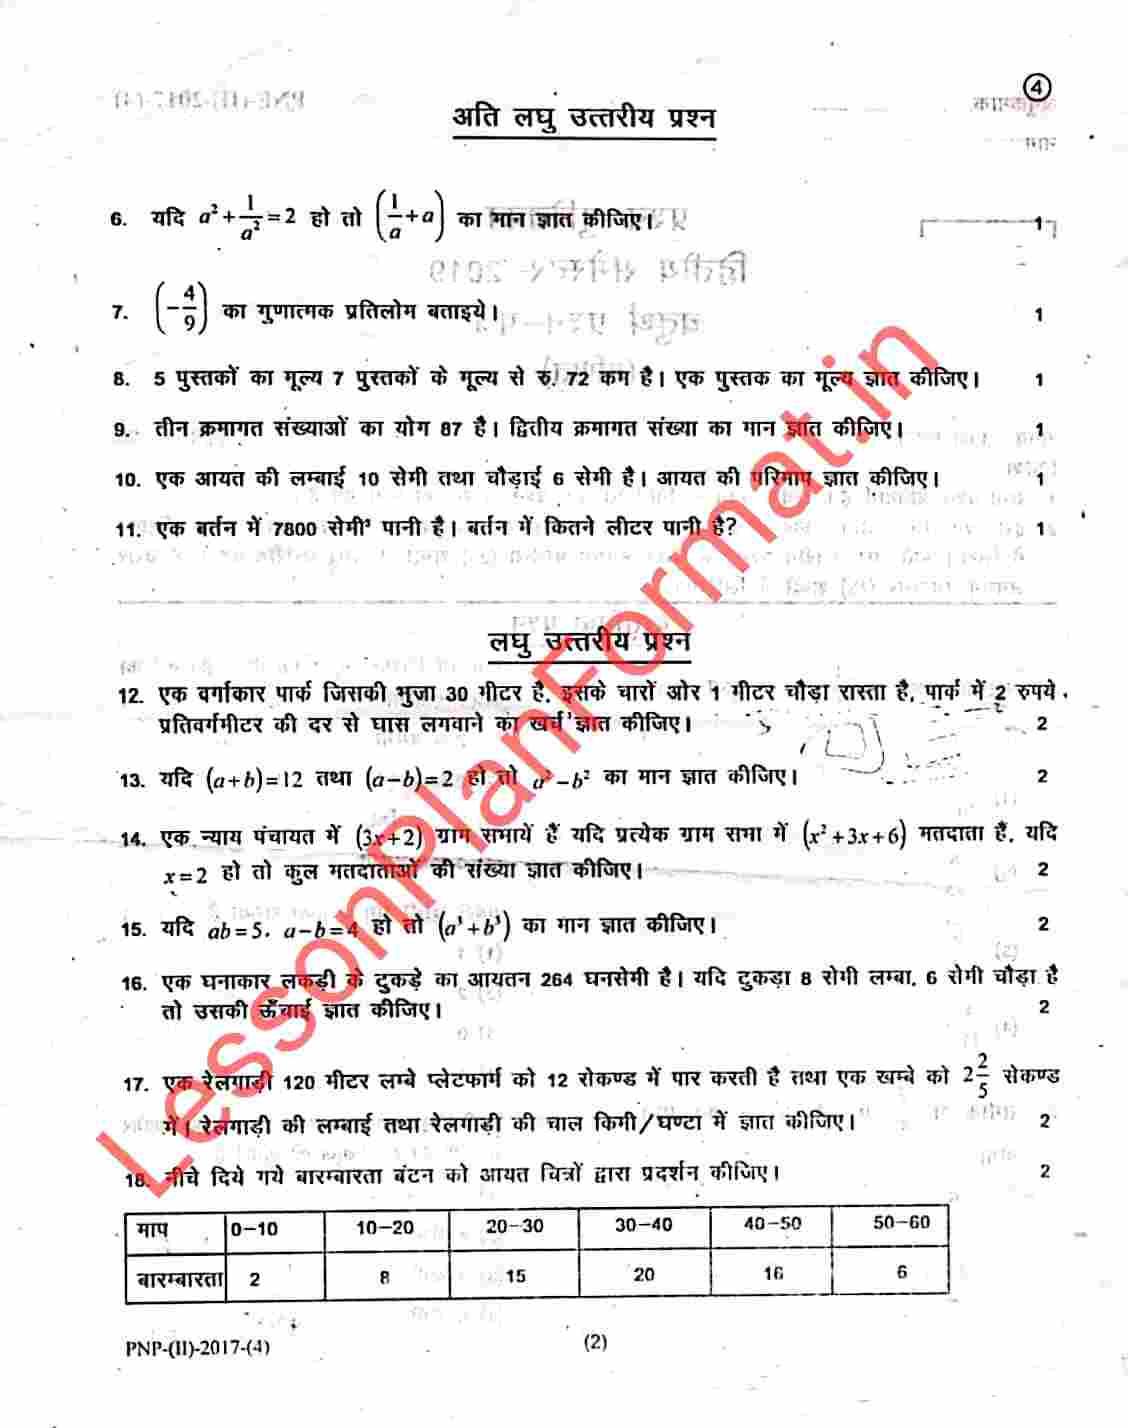 Up Btc 2nd Semester Exam Question Paper 2019